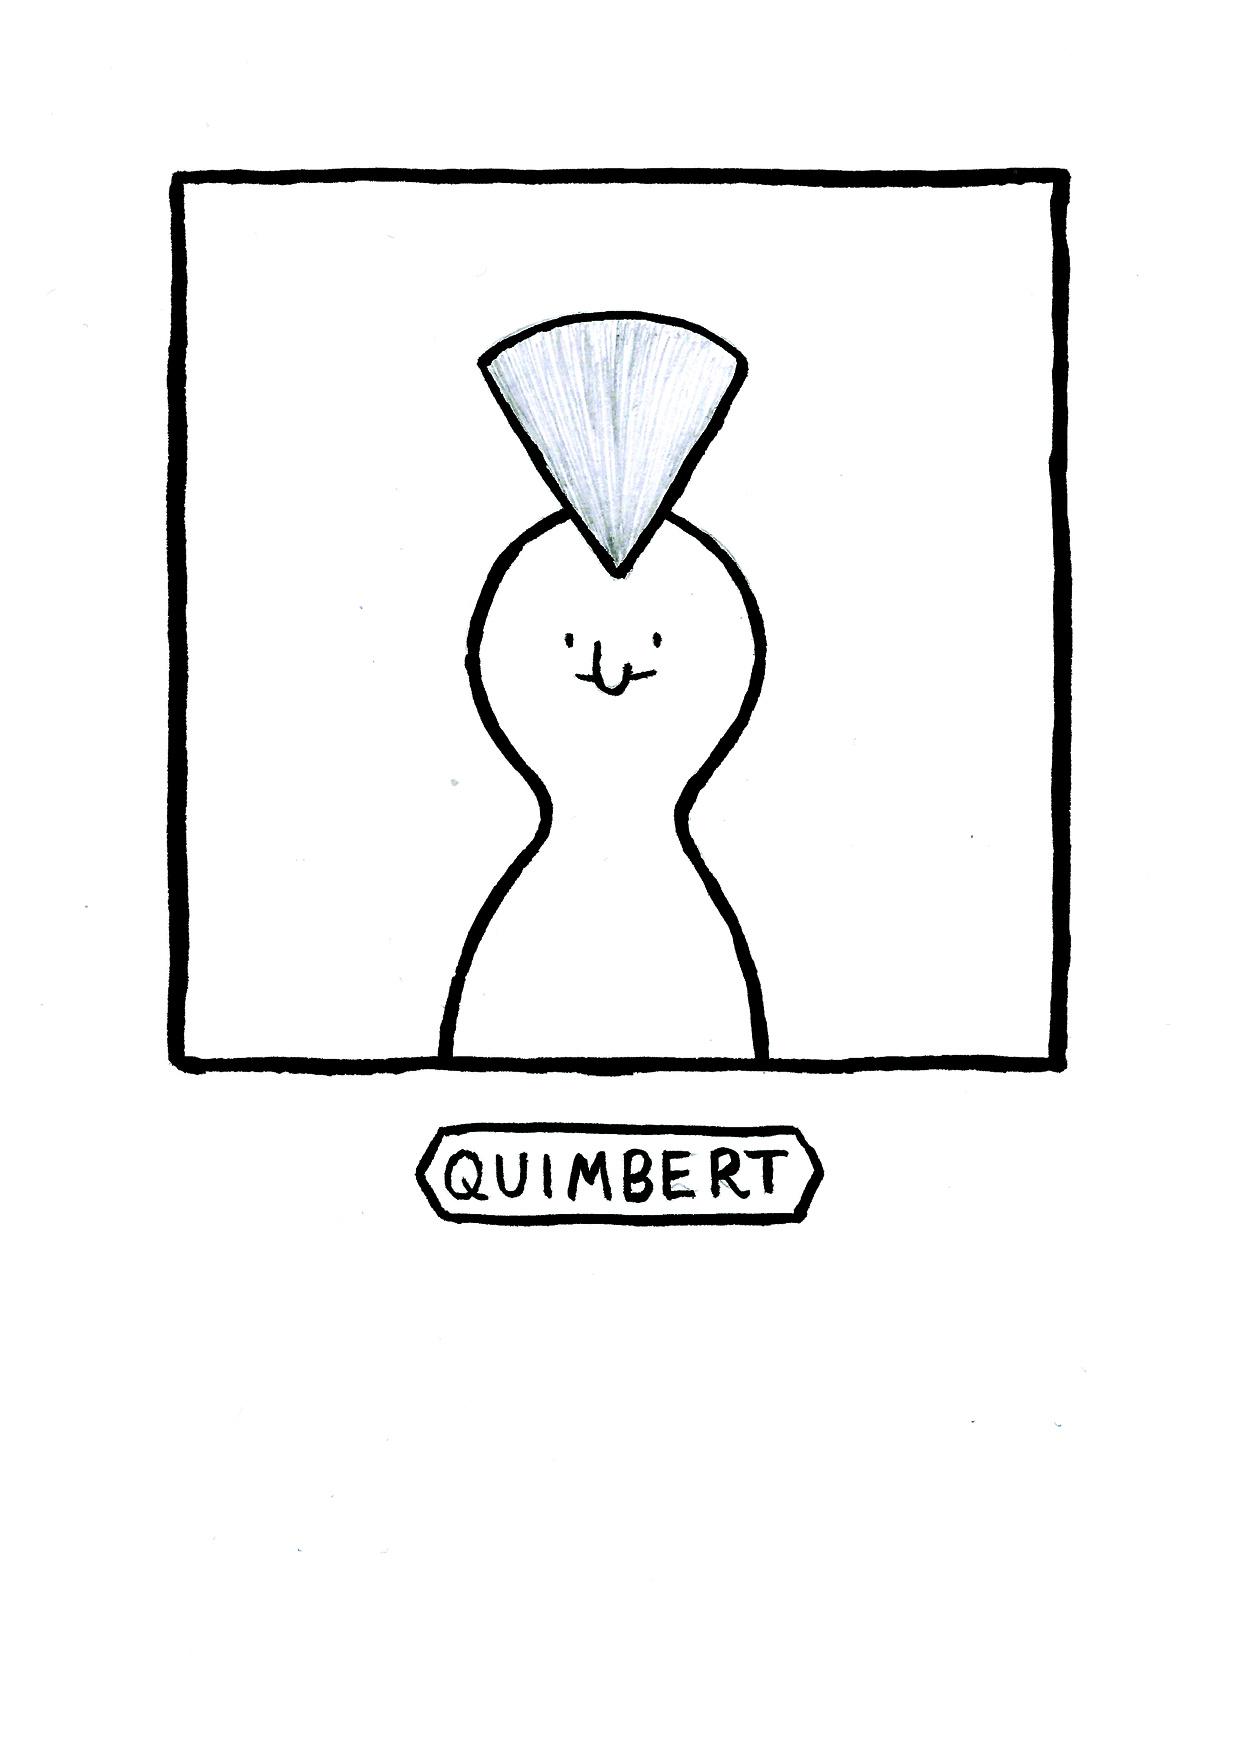 Quimbert